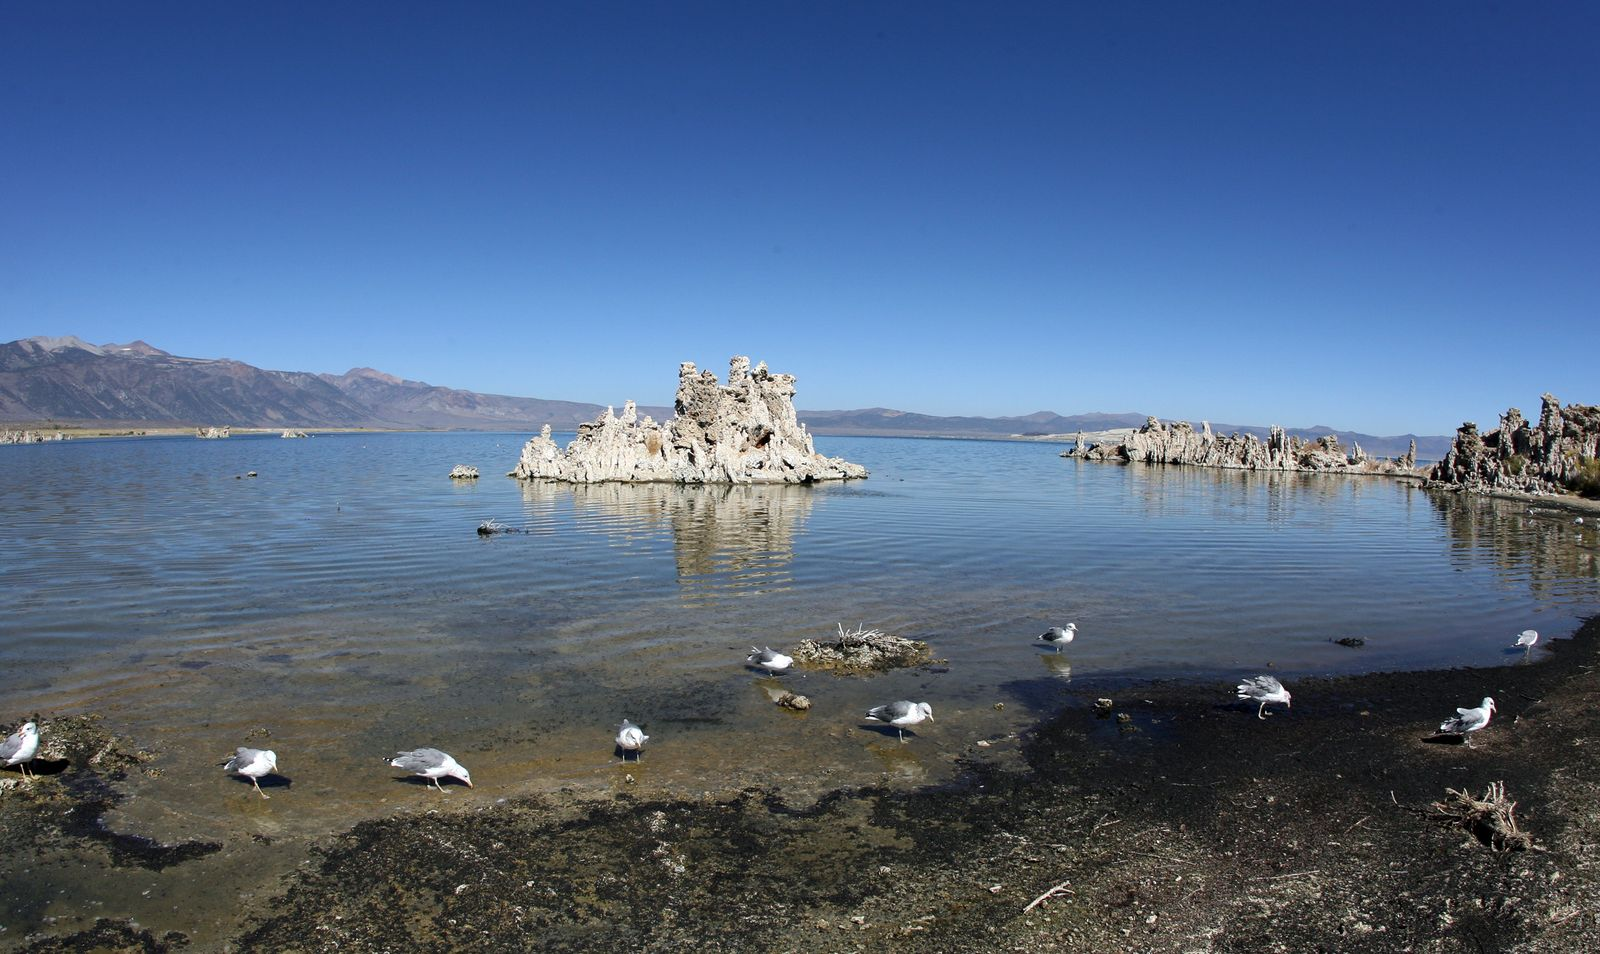 Mono Lake / Arsen-Bakterien